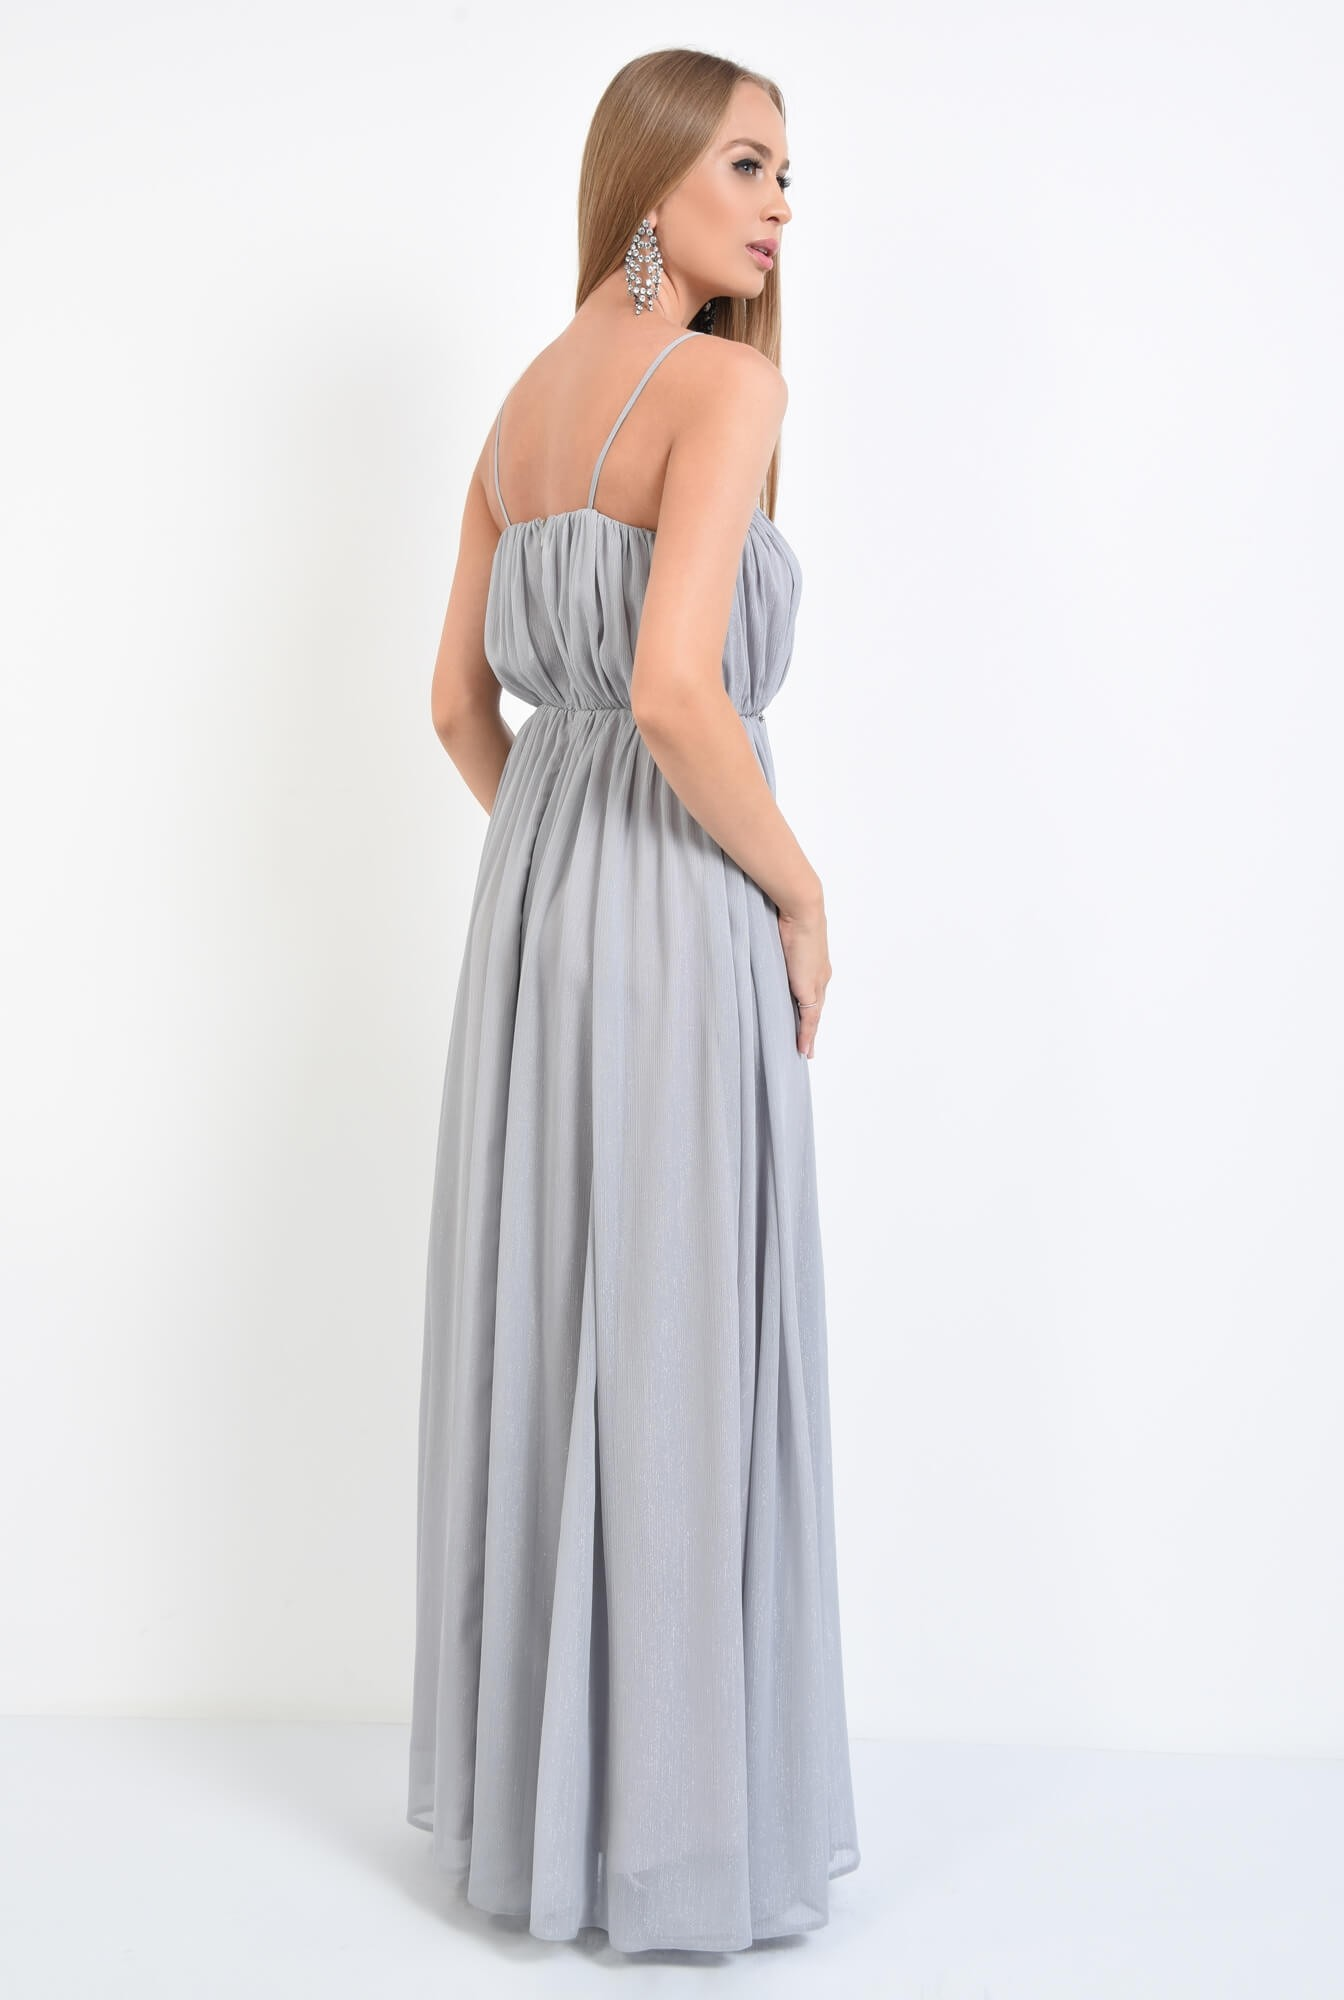 1 - rochie de seara, pliuri, argintiu, lunga, voal